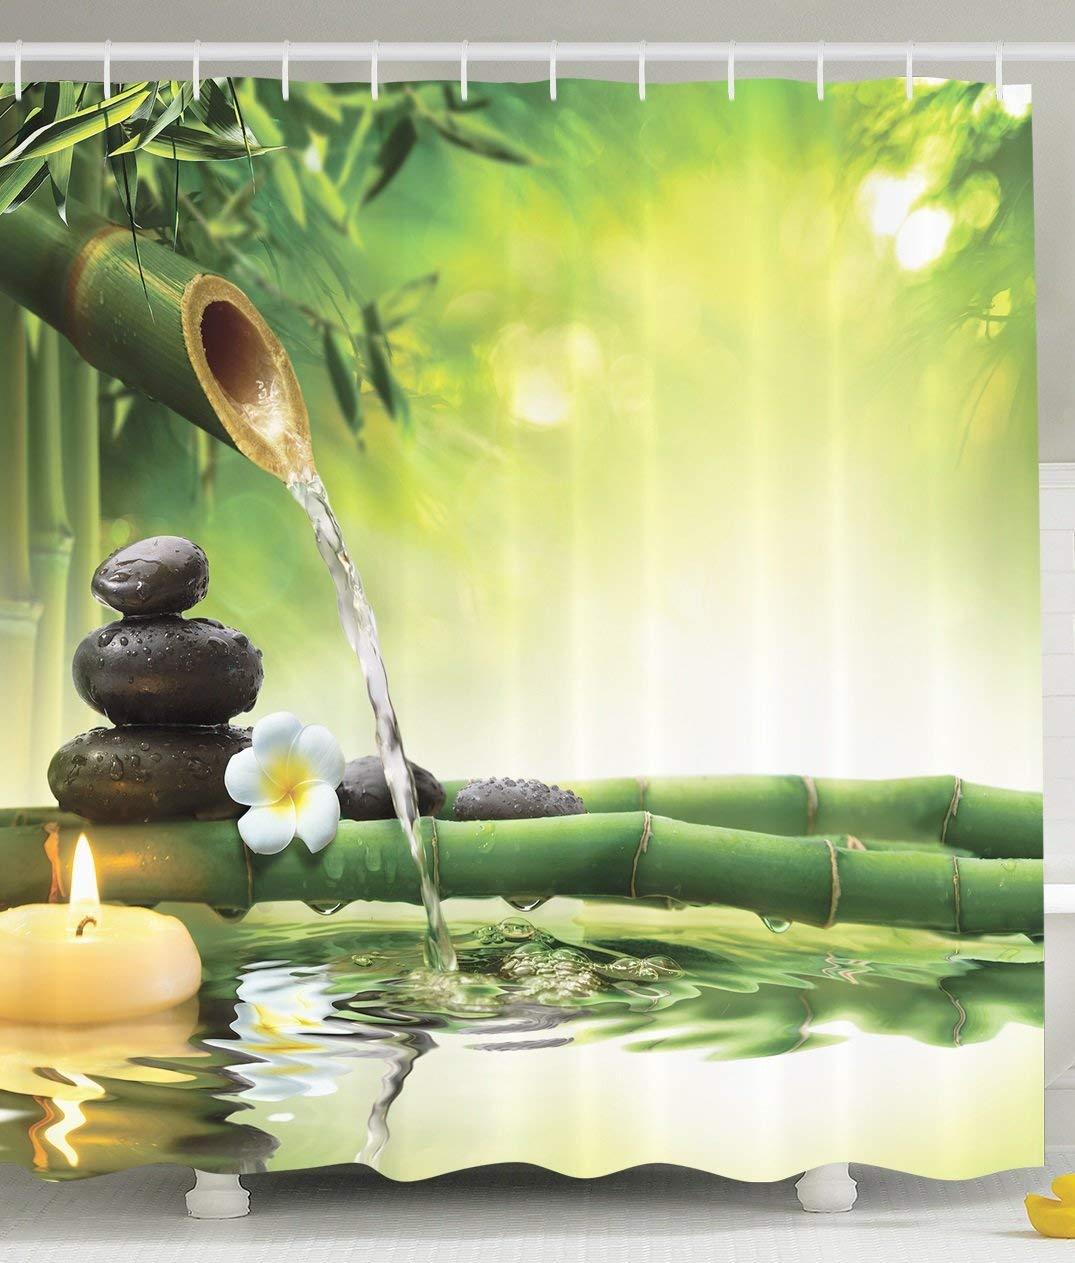 Zen Garden Theme Decor View for Bathroom Shower Curtain